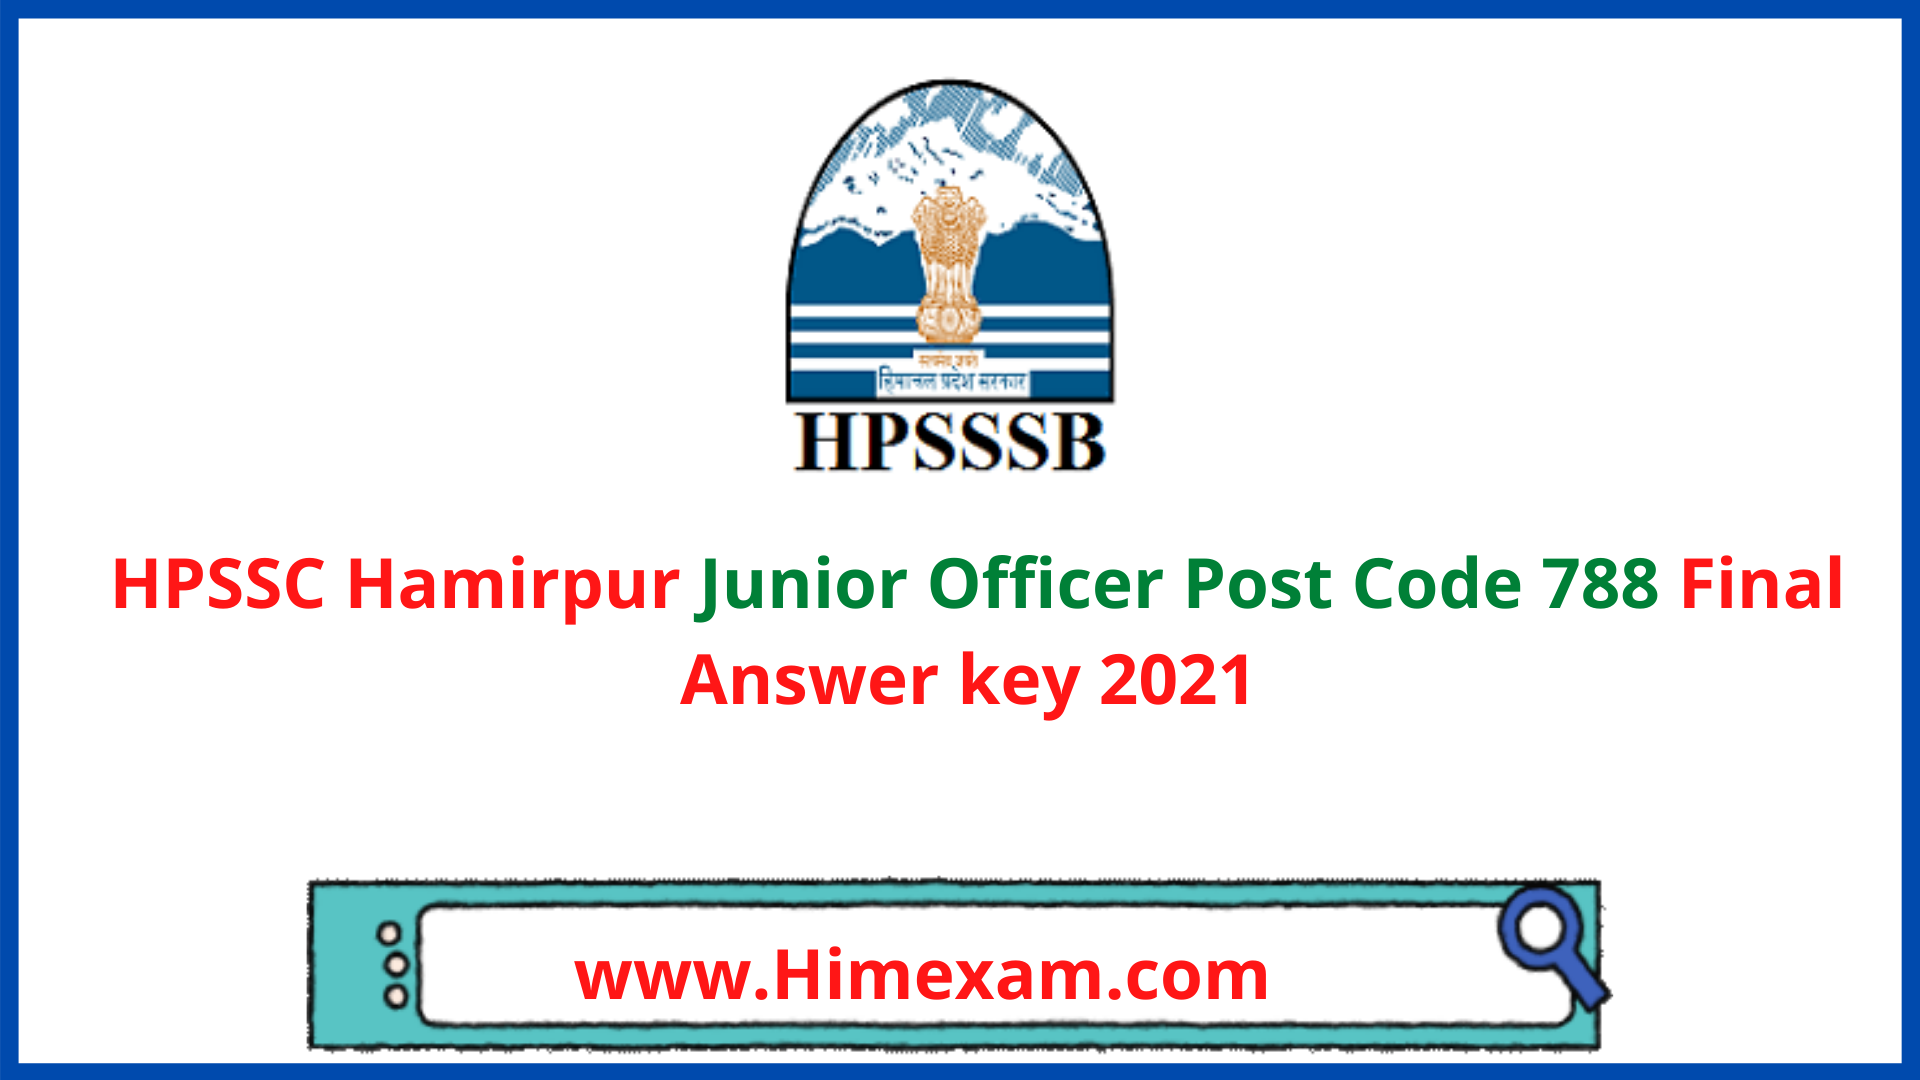 HPSSC Hamirpur Junior Officer Post Code 788 Final Answer key 2021